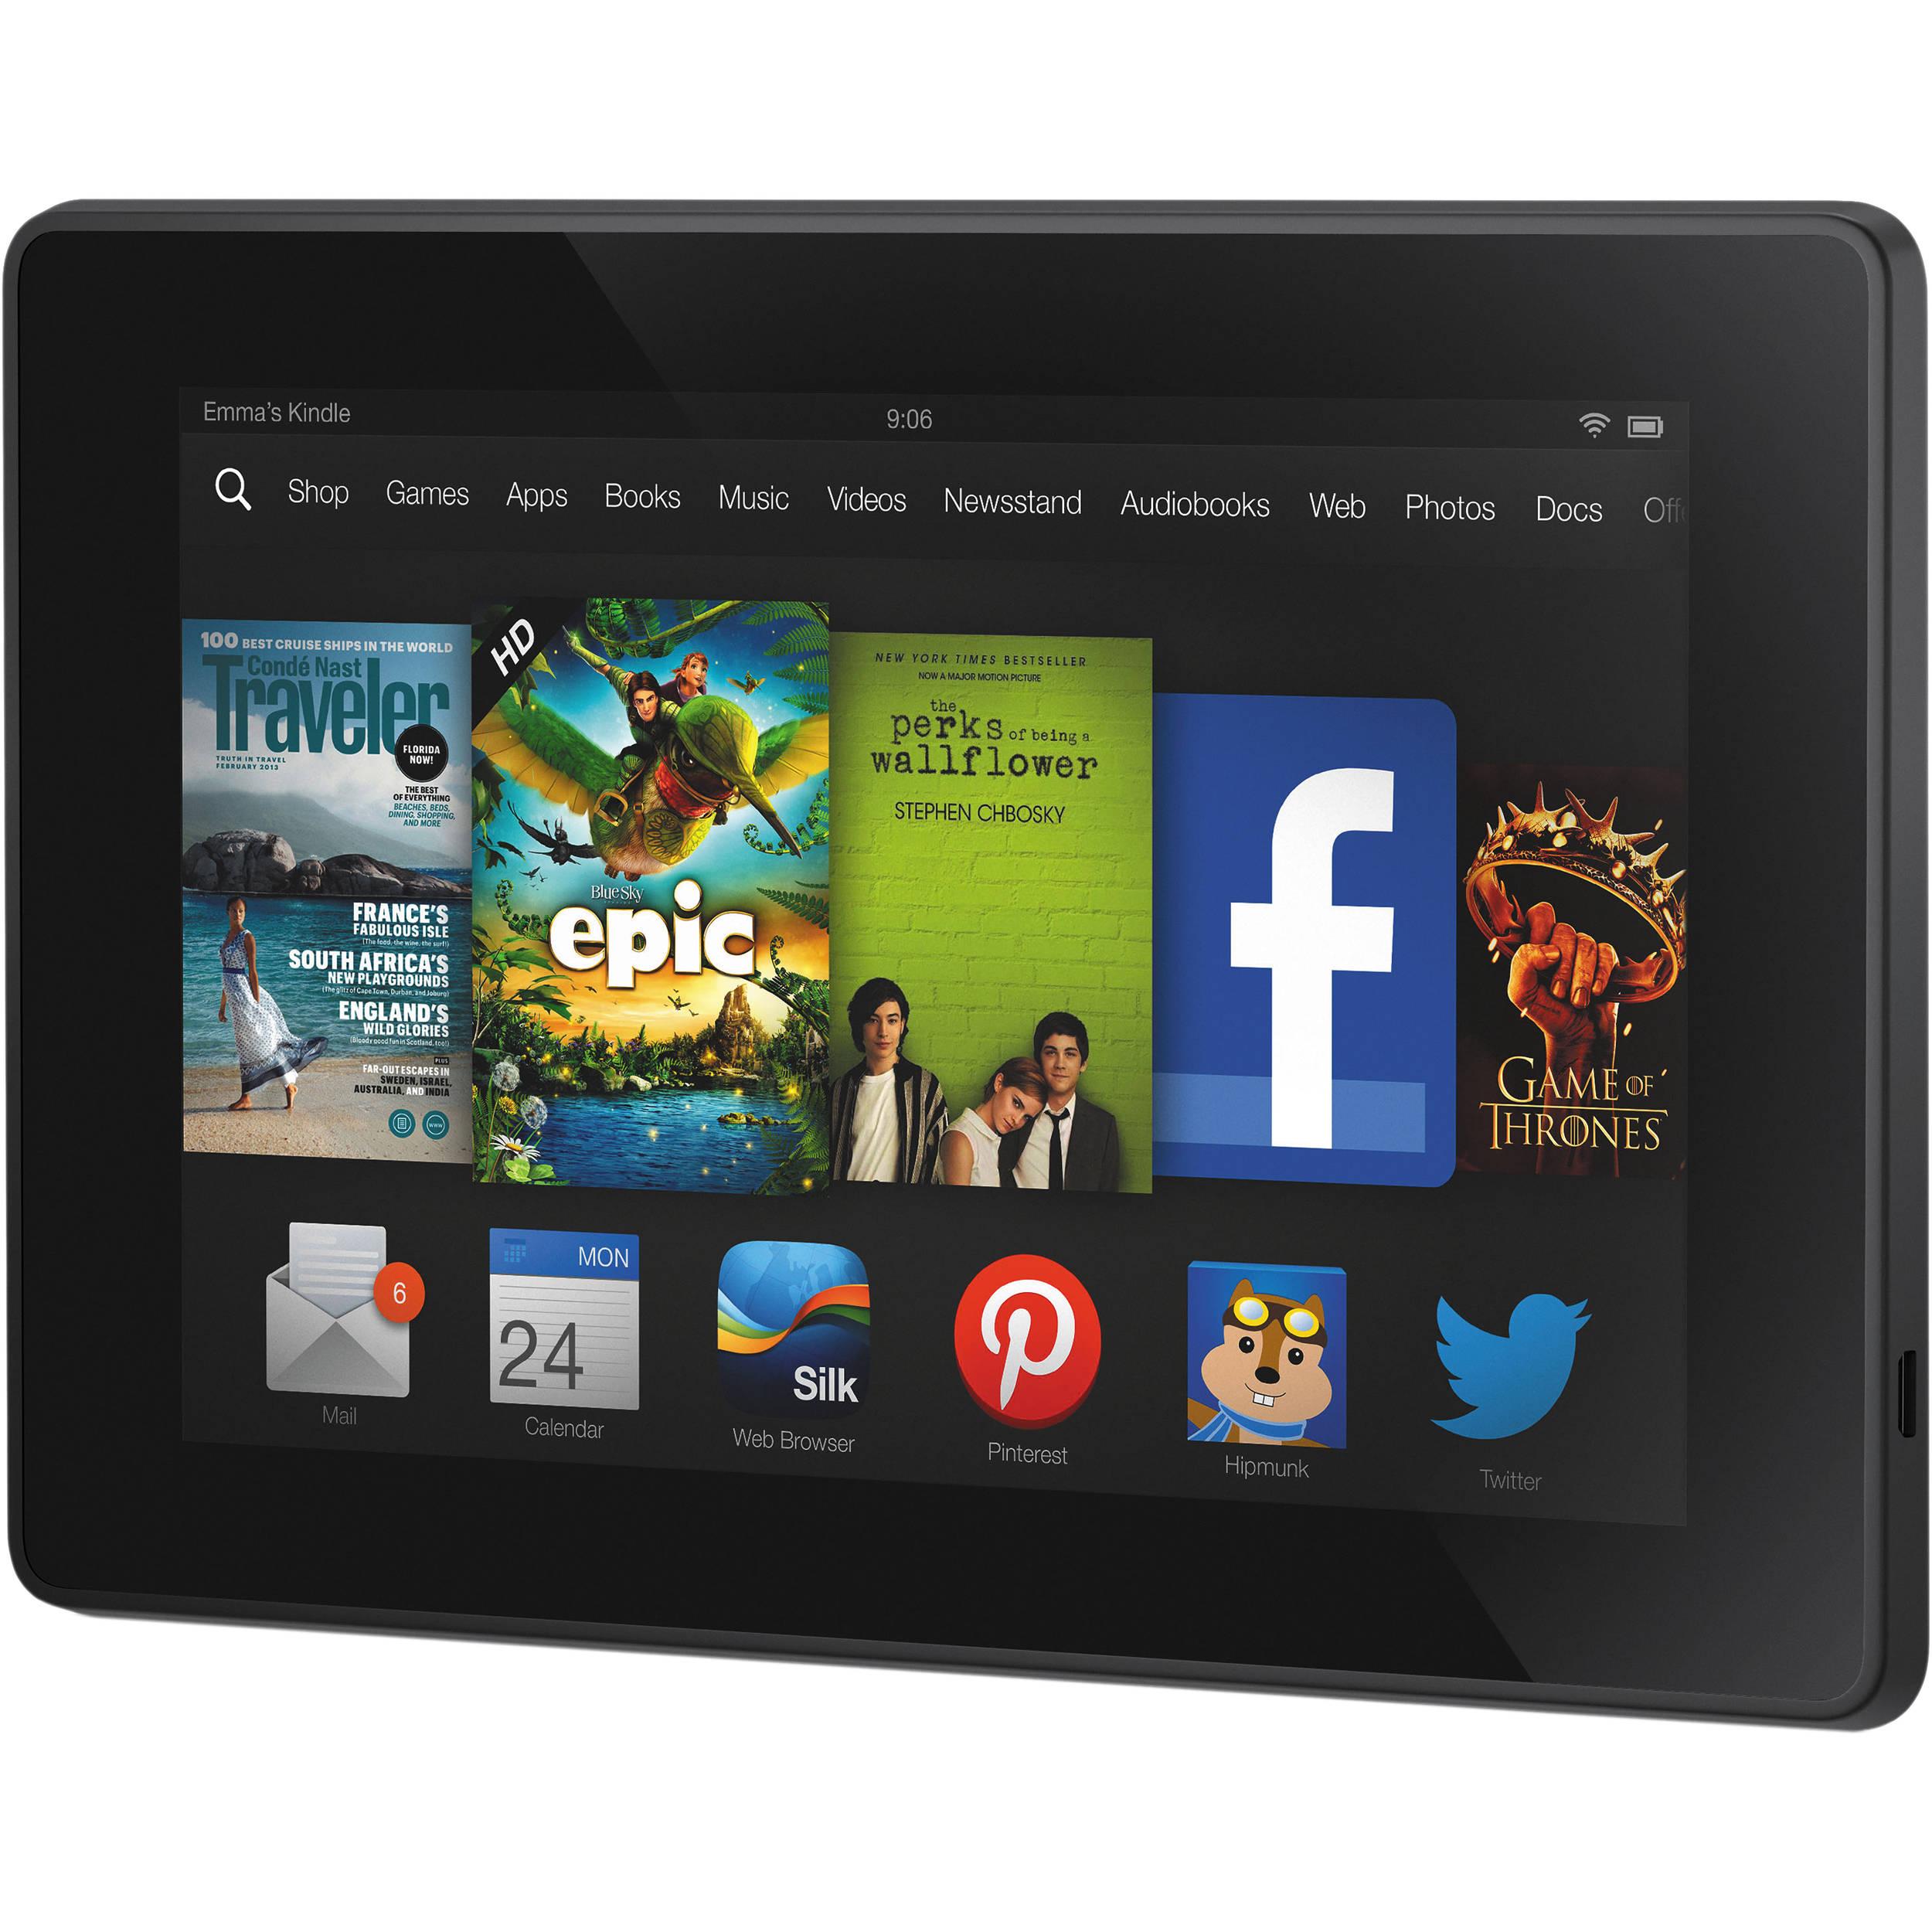 Kindle 16GB Fire HD 7